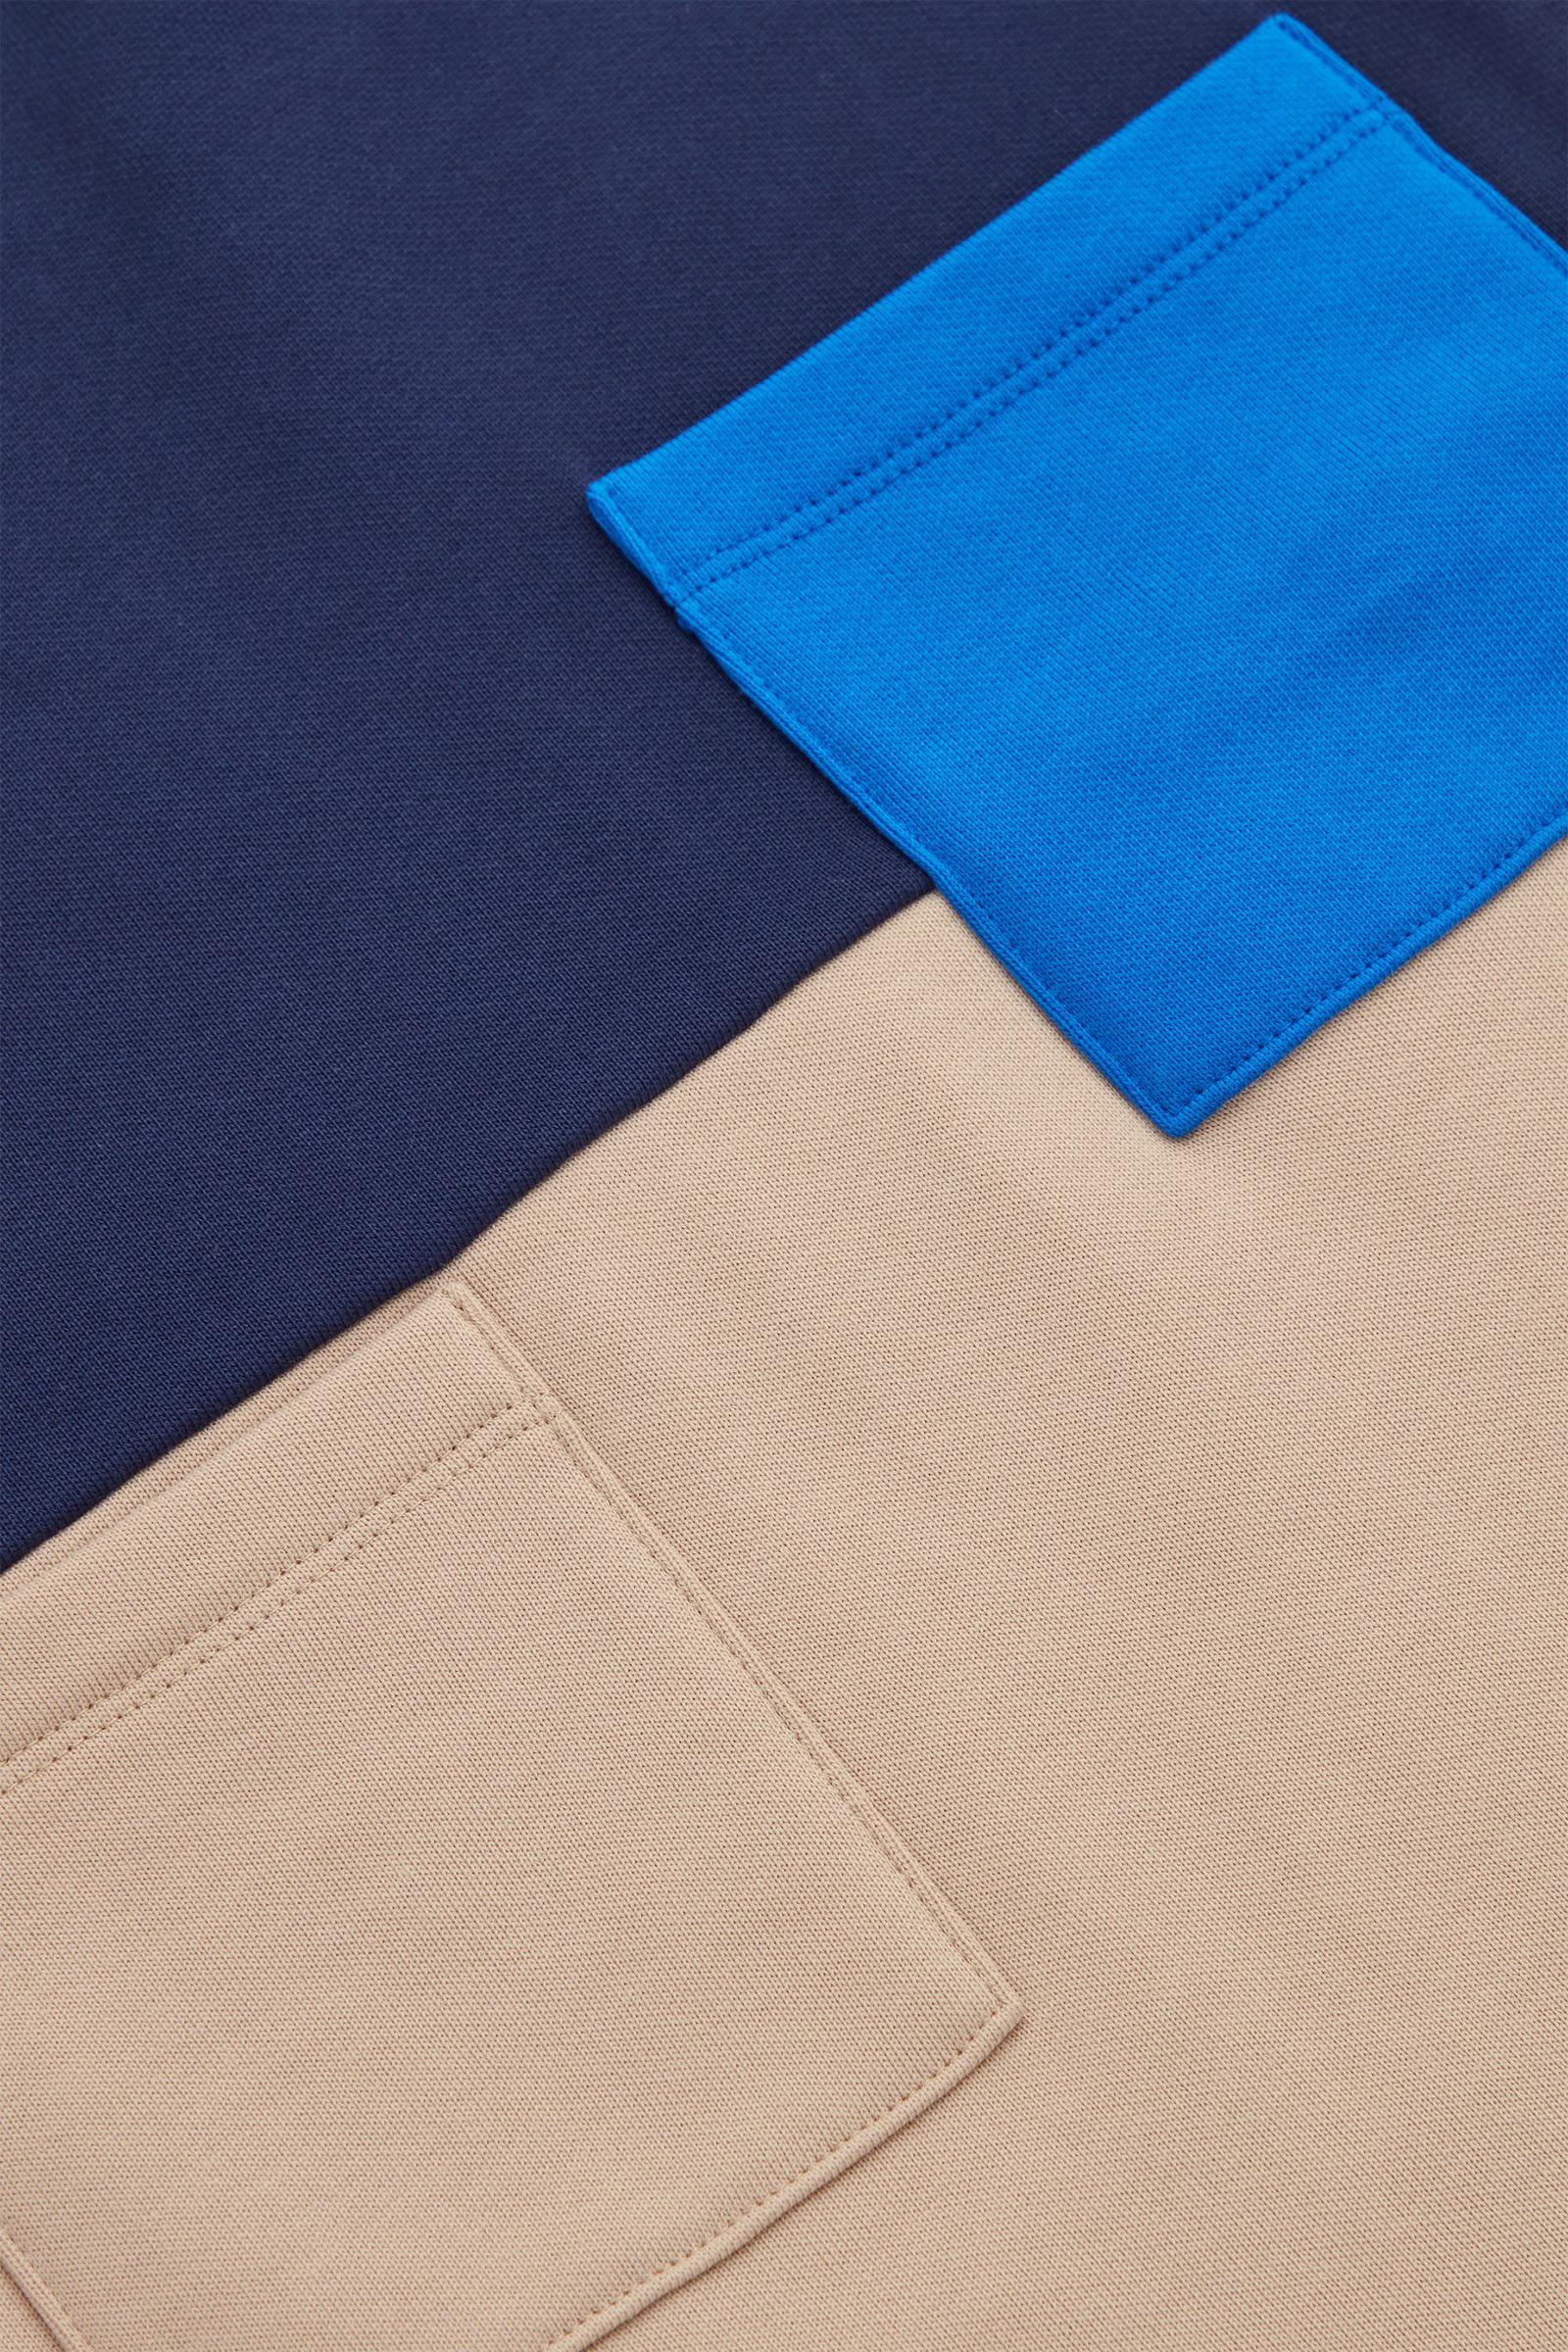 COS 오가닉 코튼 컬러 블록 스웻셔츠 드레스의 블루컬러 Detail입니다.